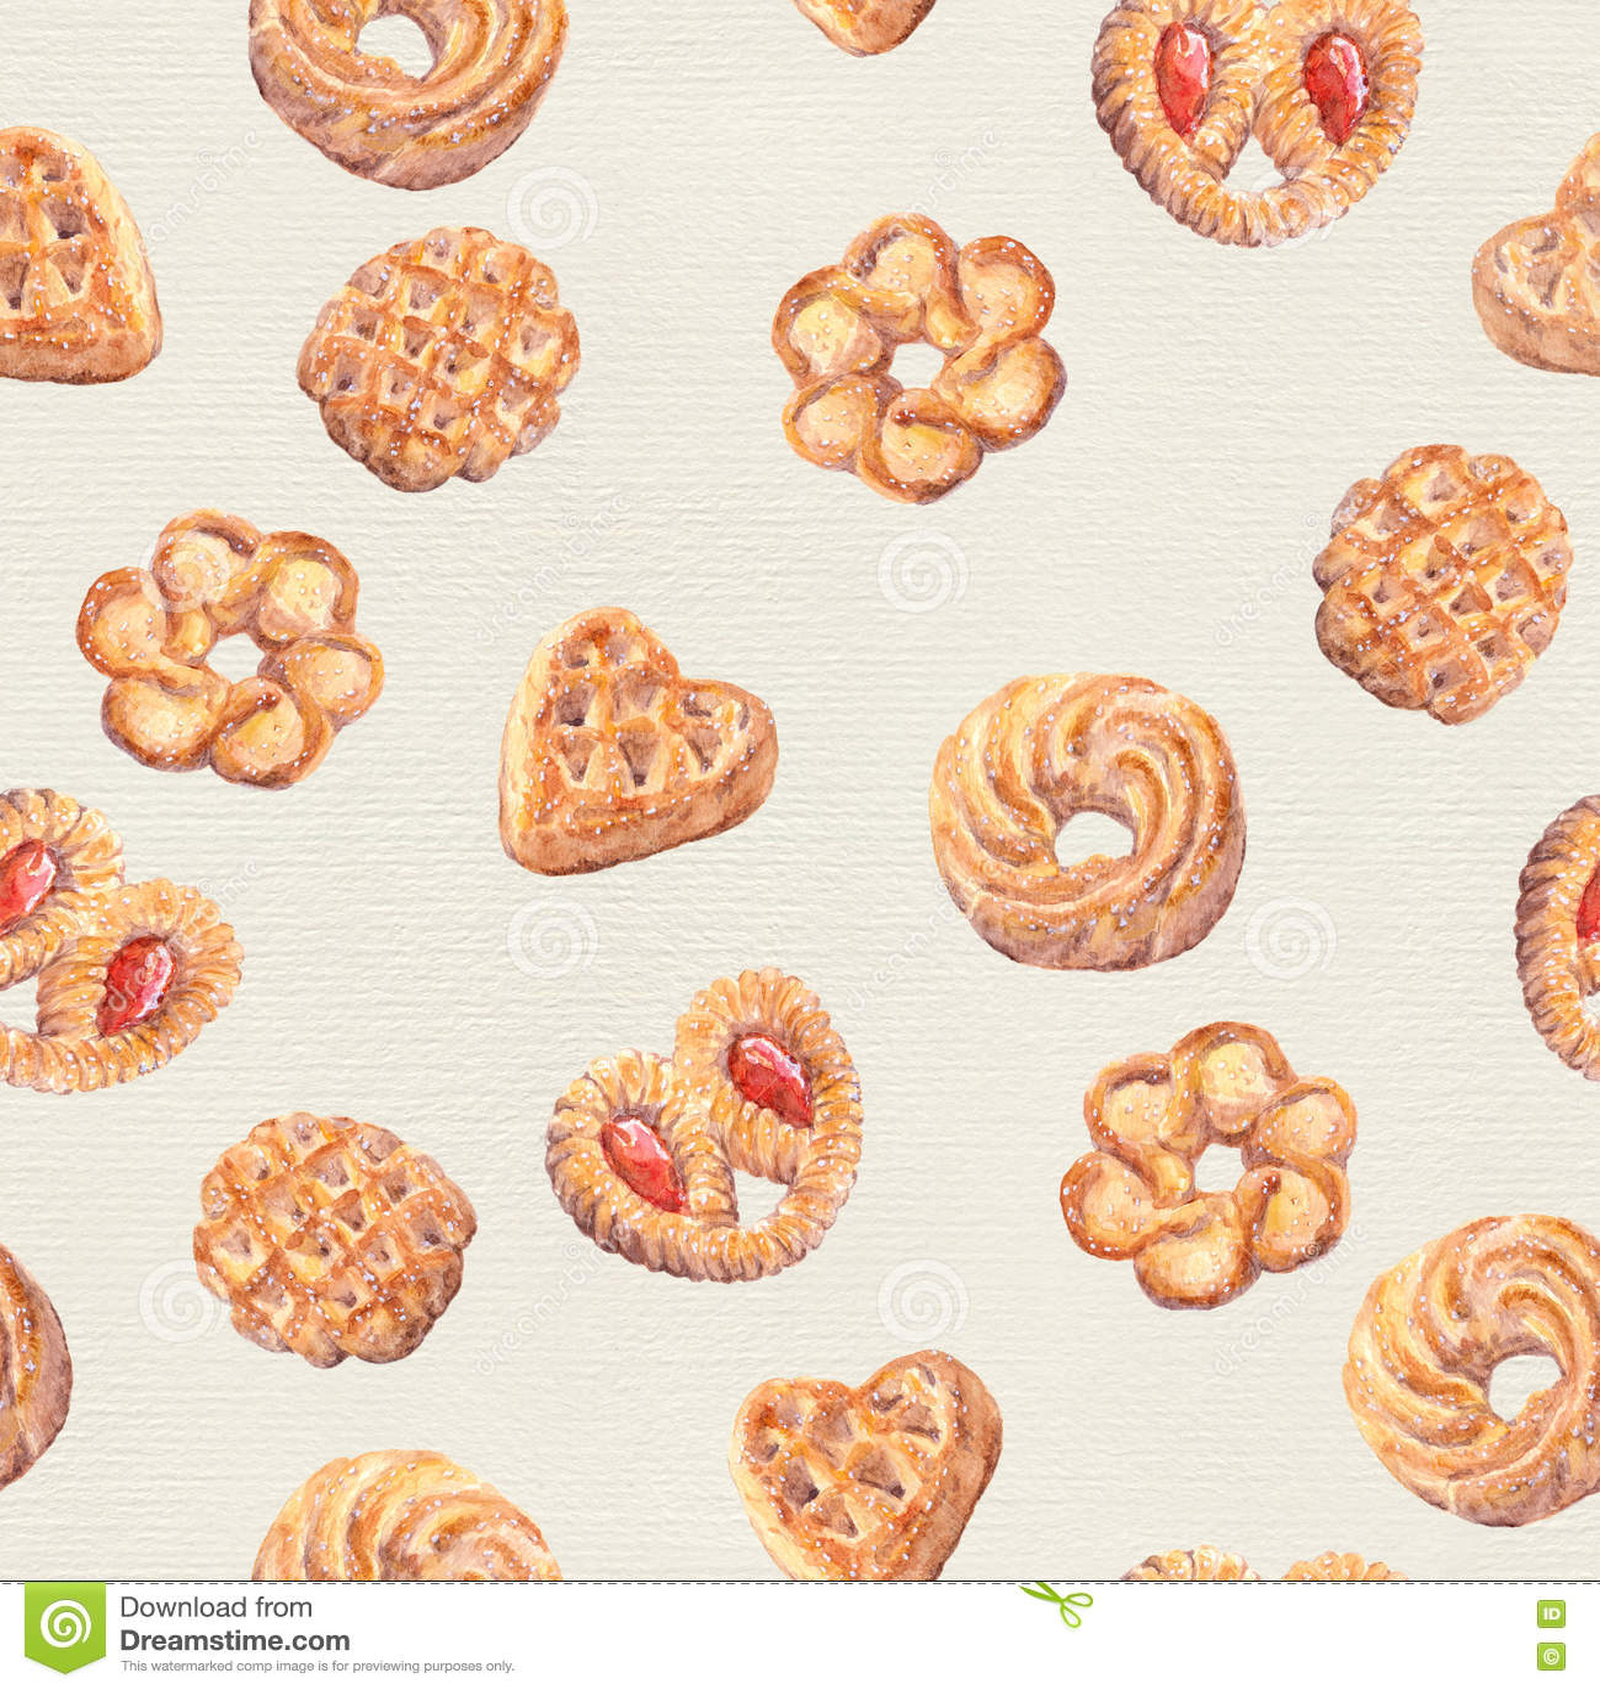 Seamless Cookies Wallpaper Baking Food Design Stock Illustration Image 74327457